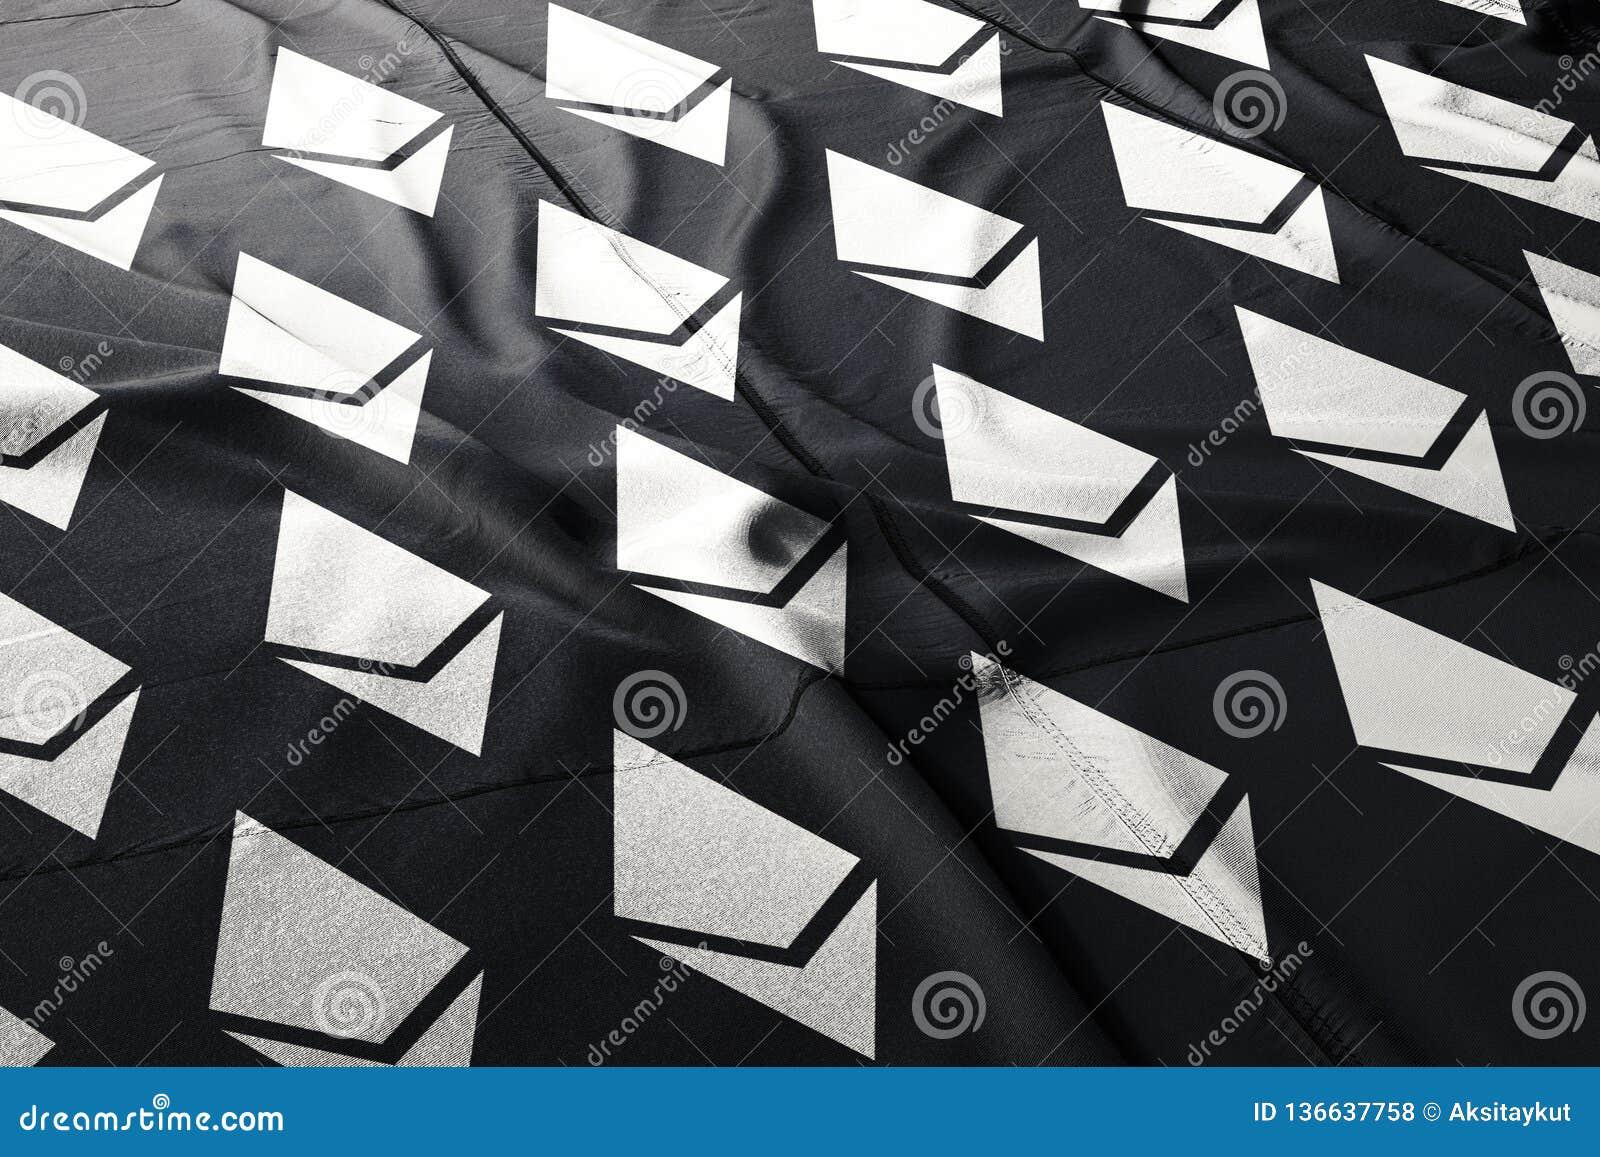 Ethereum埃特旗子隐藏布料的例证